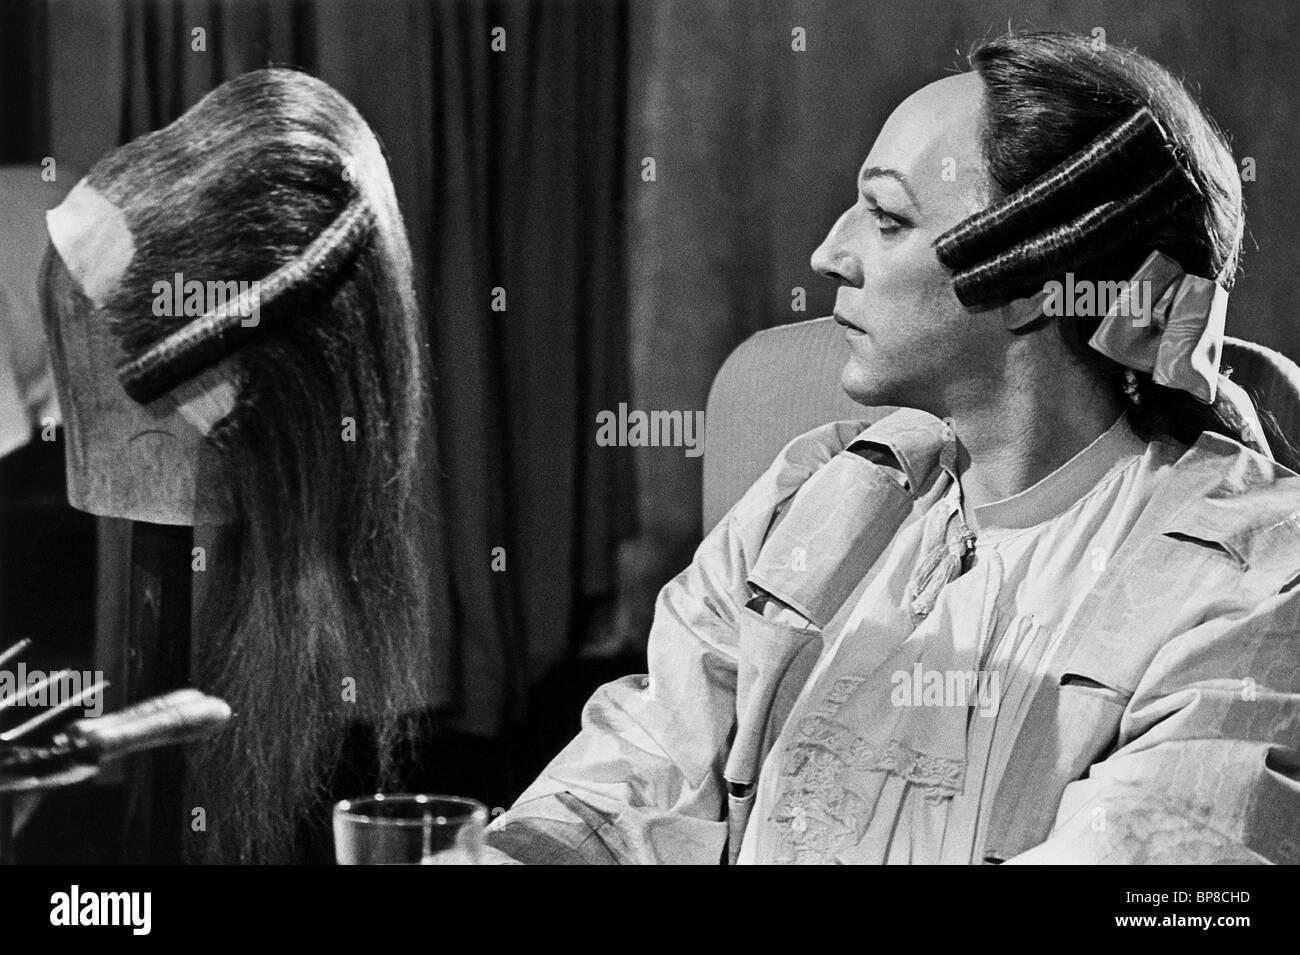 Suki Waterhouse,Carla Humphries (b. 1988) XXX pic Kym Wilson,Sarah Kennedy (actress)